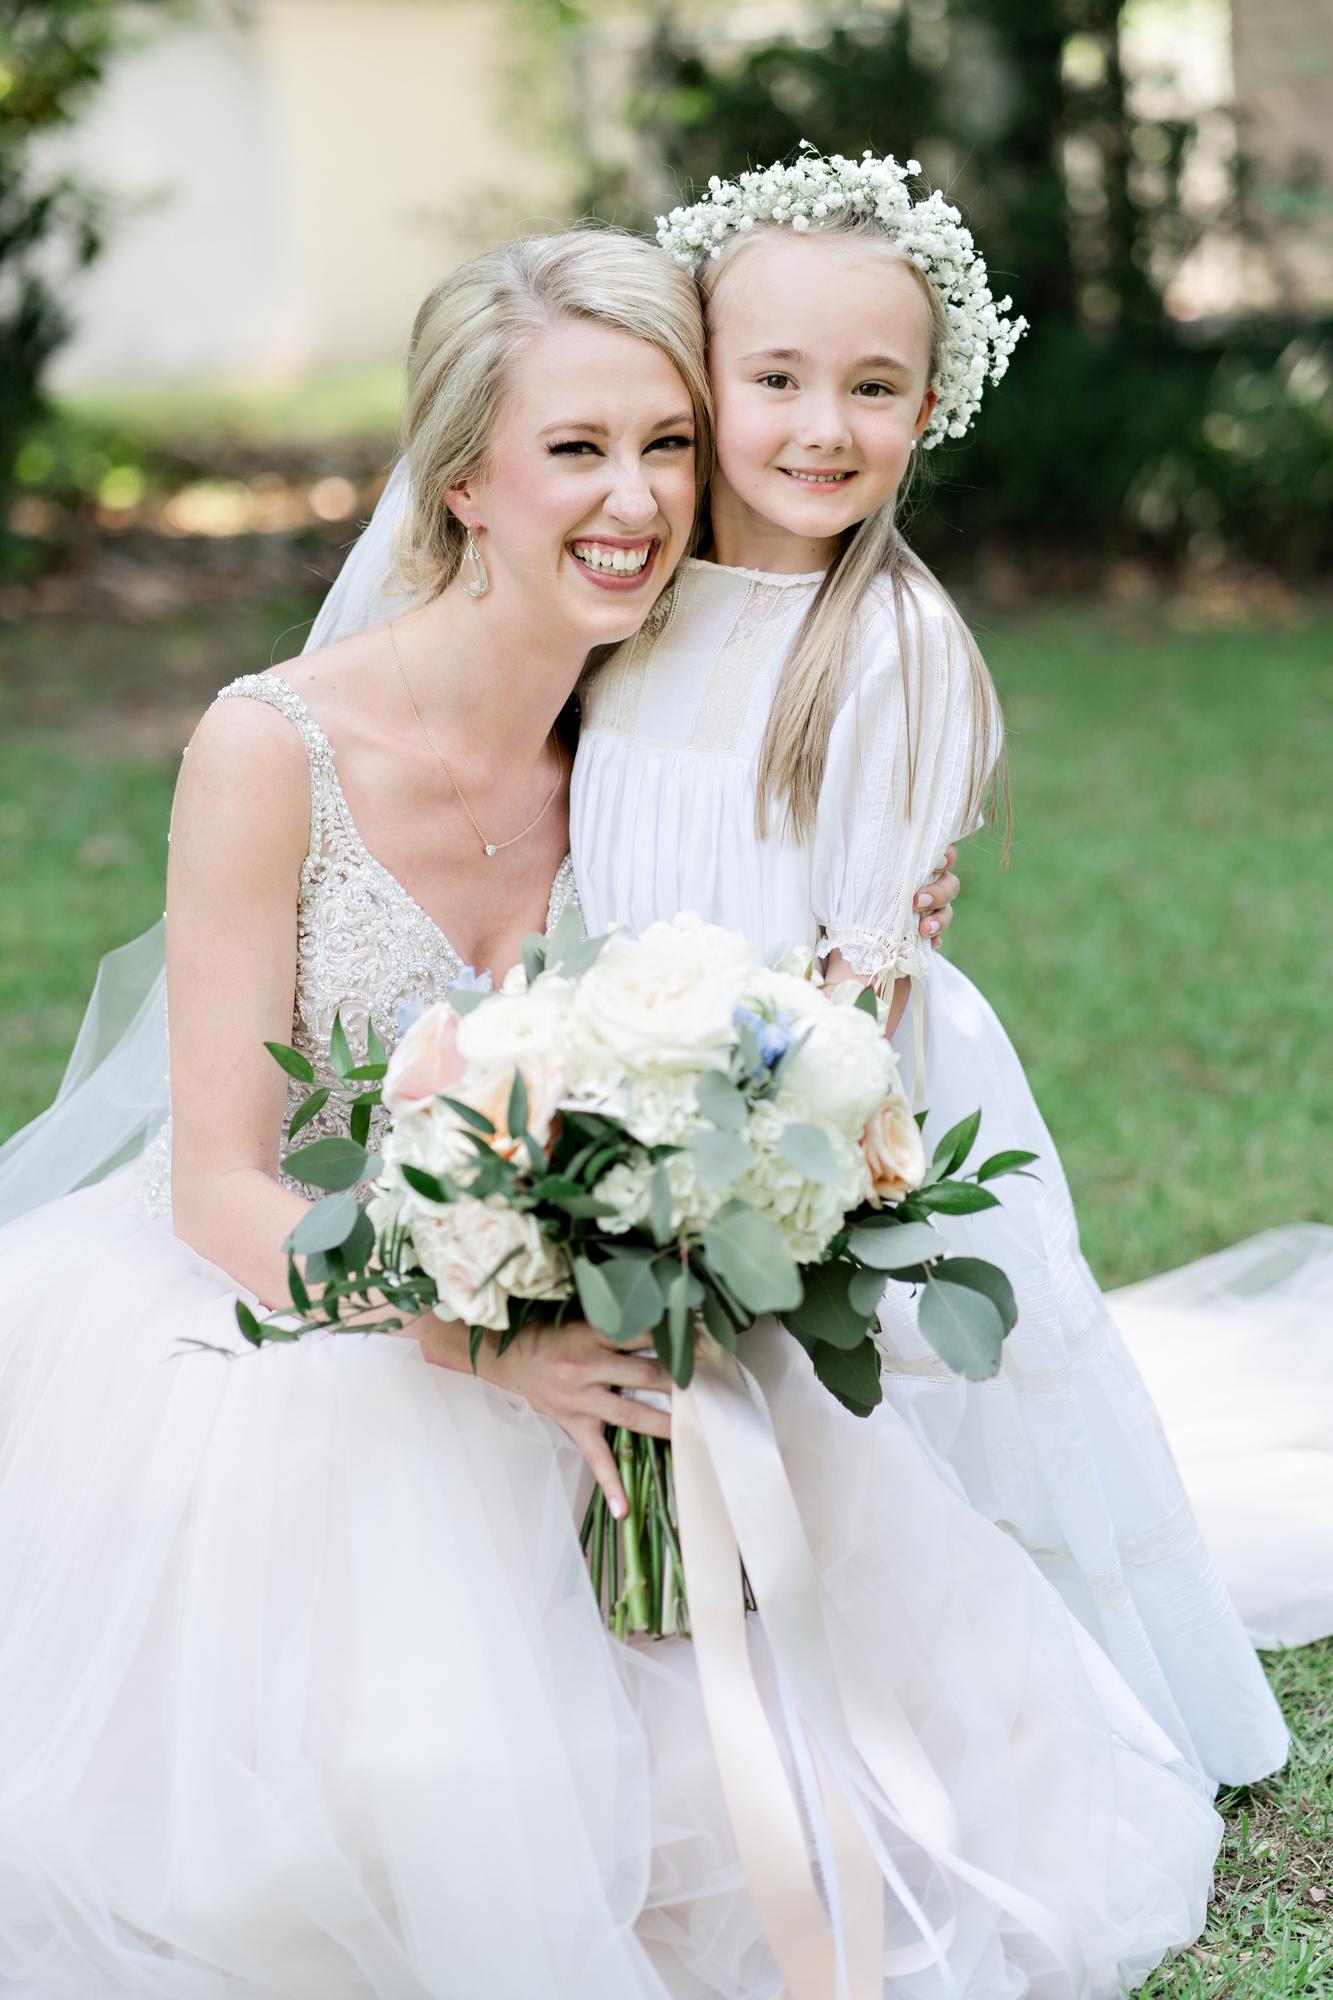 Alabama-Photographers-Nick-Drollette-Wedding-Photography-121.jpg